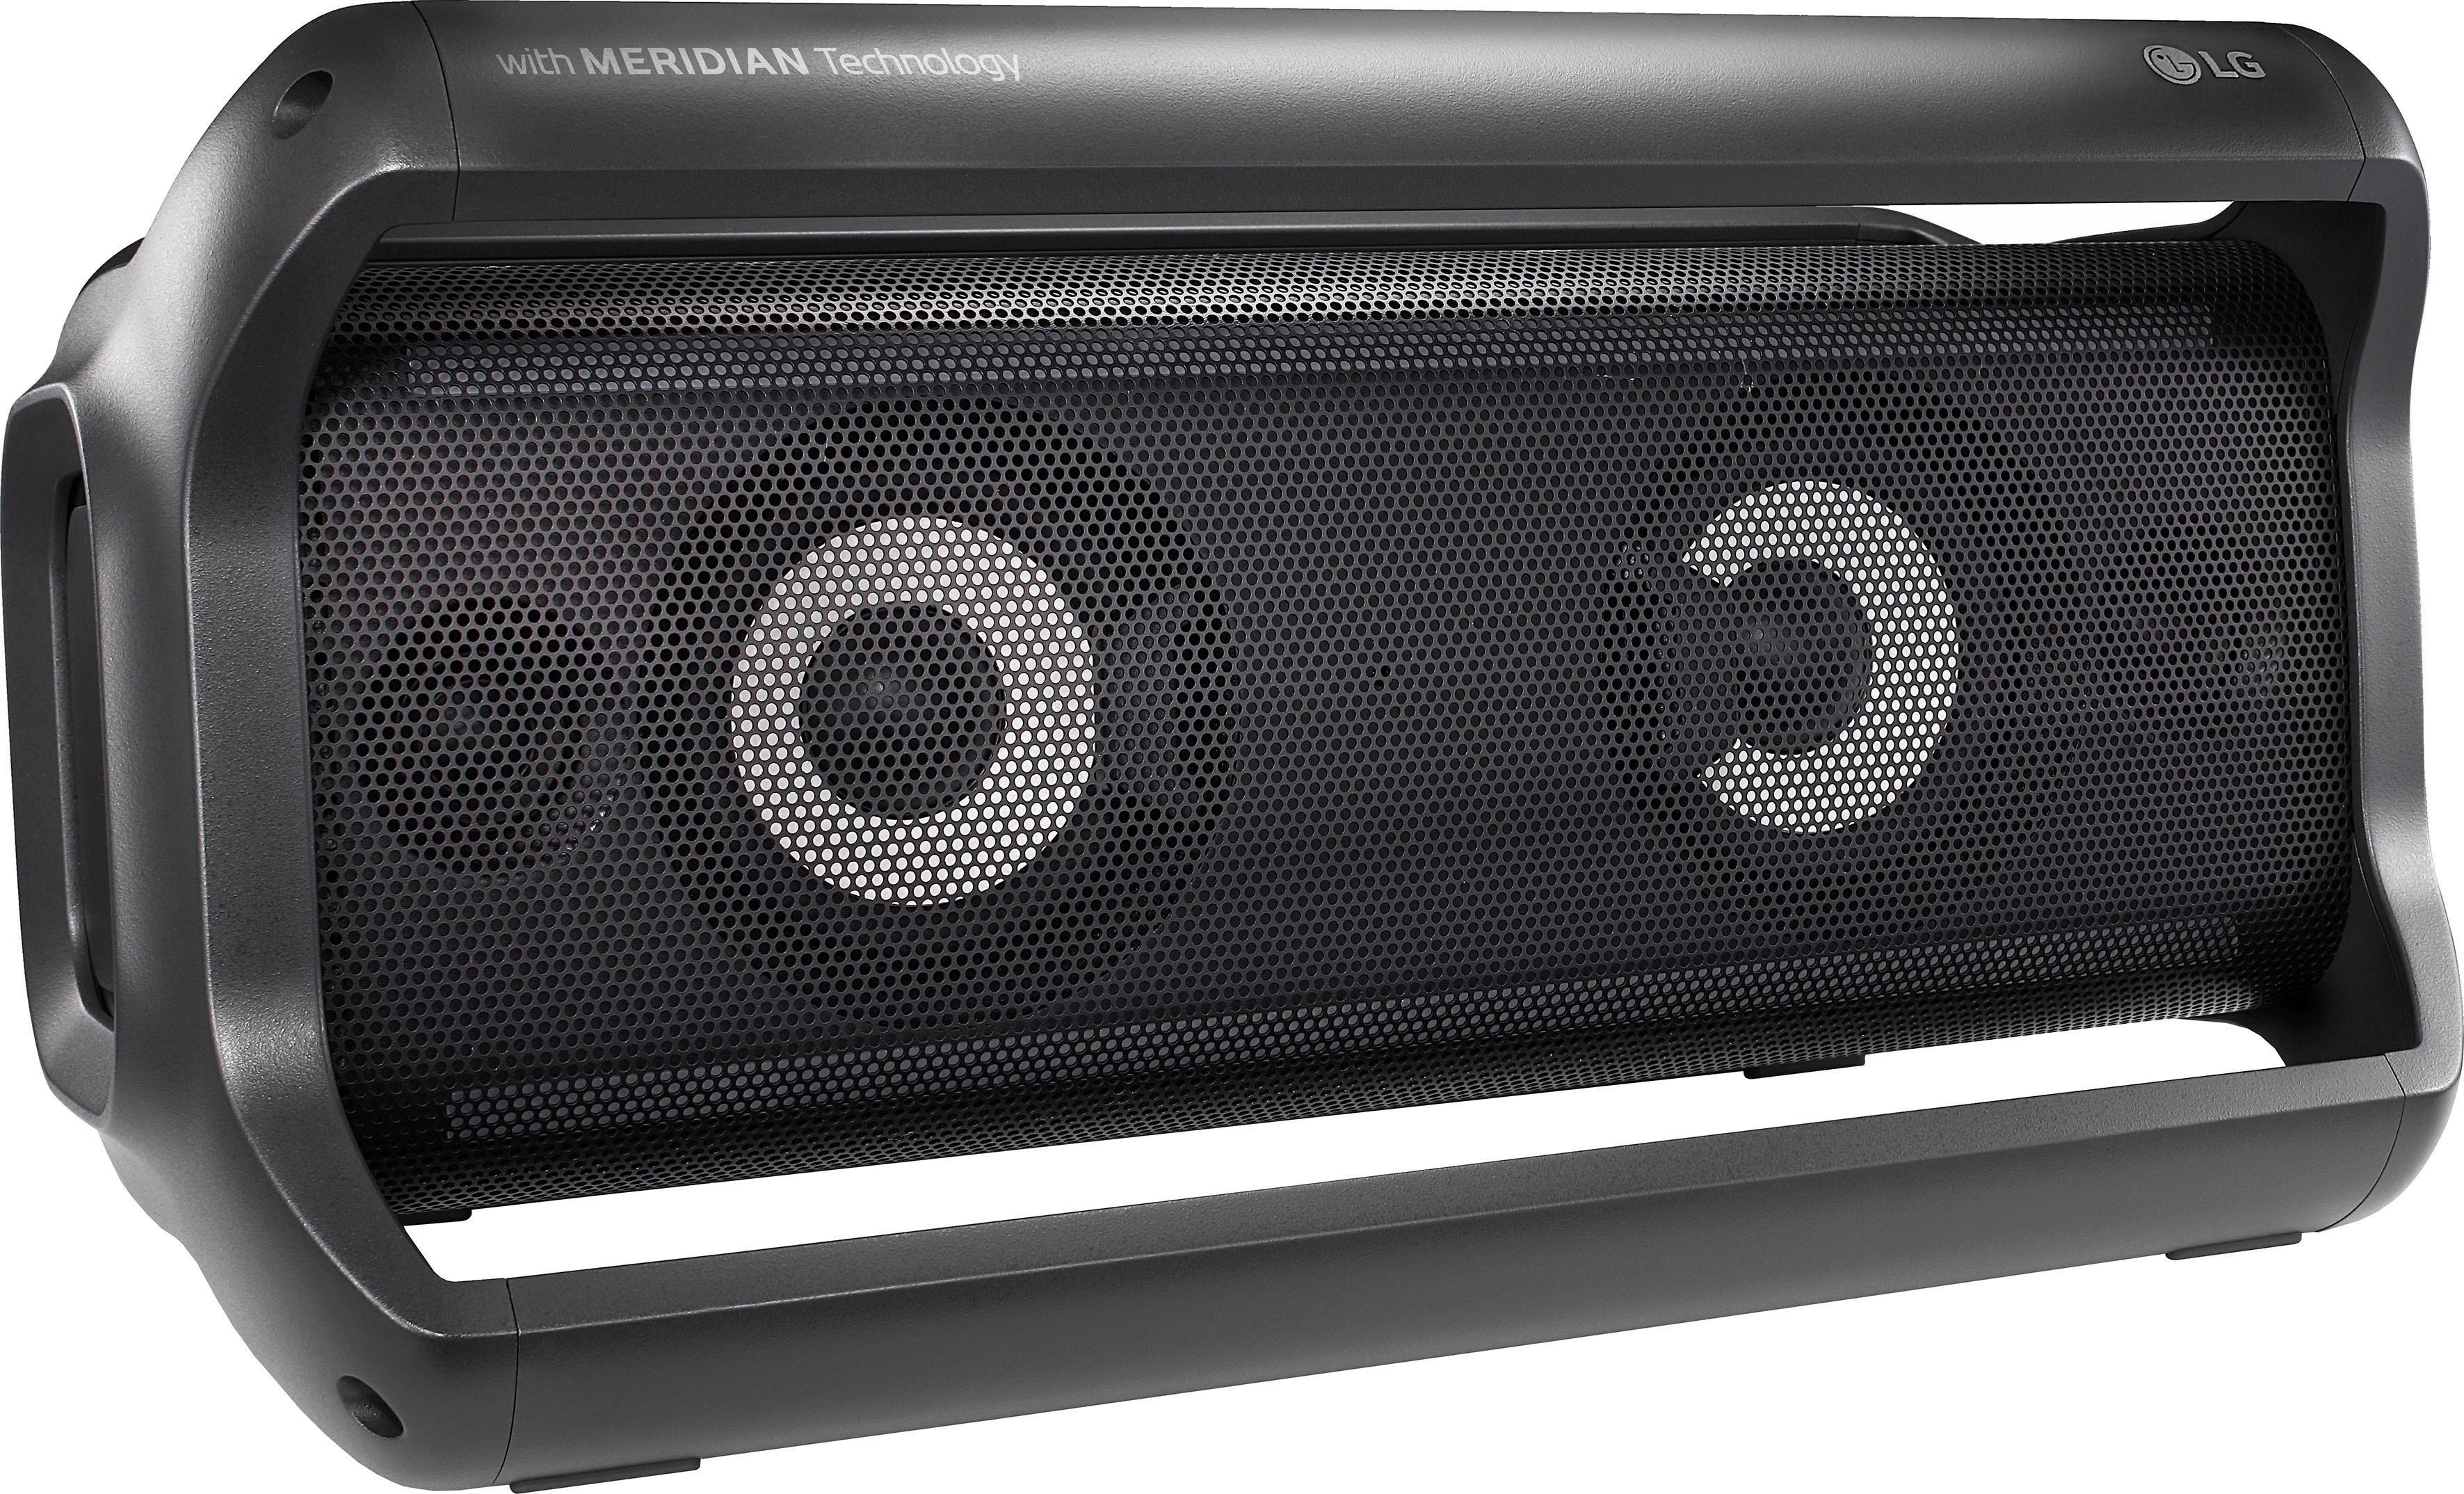 LG »PK7« 2.0 bluetooth-luidspreker (bluetooth, Google Assistant, 40 W) nu online kopen bij OTTO